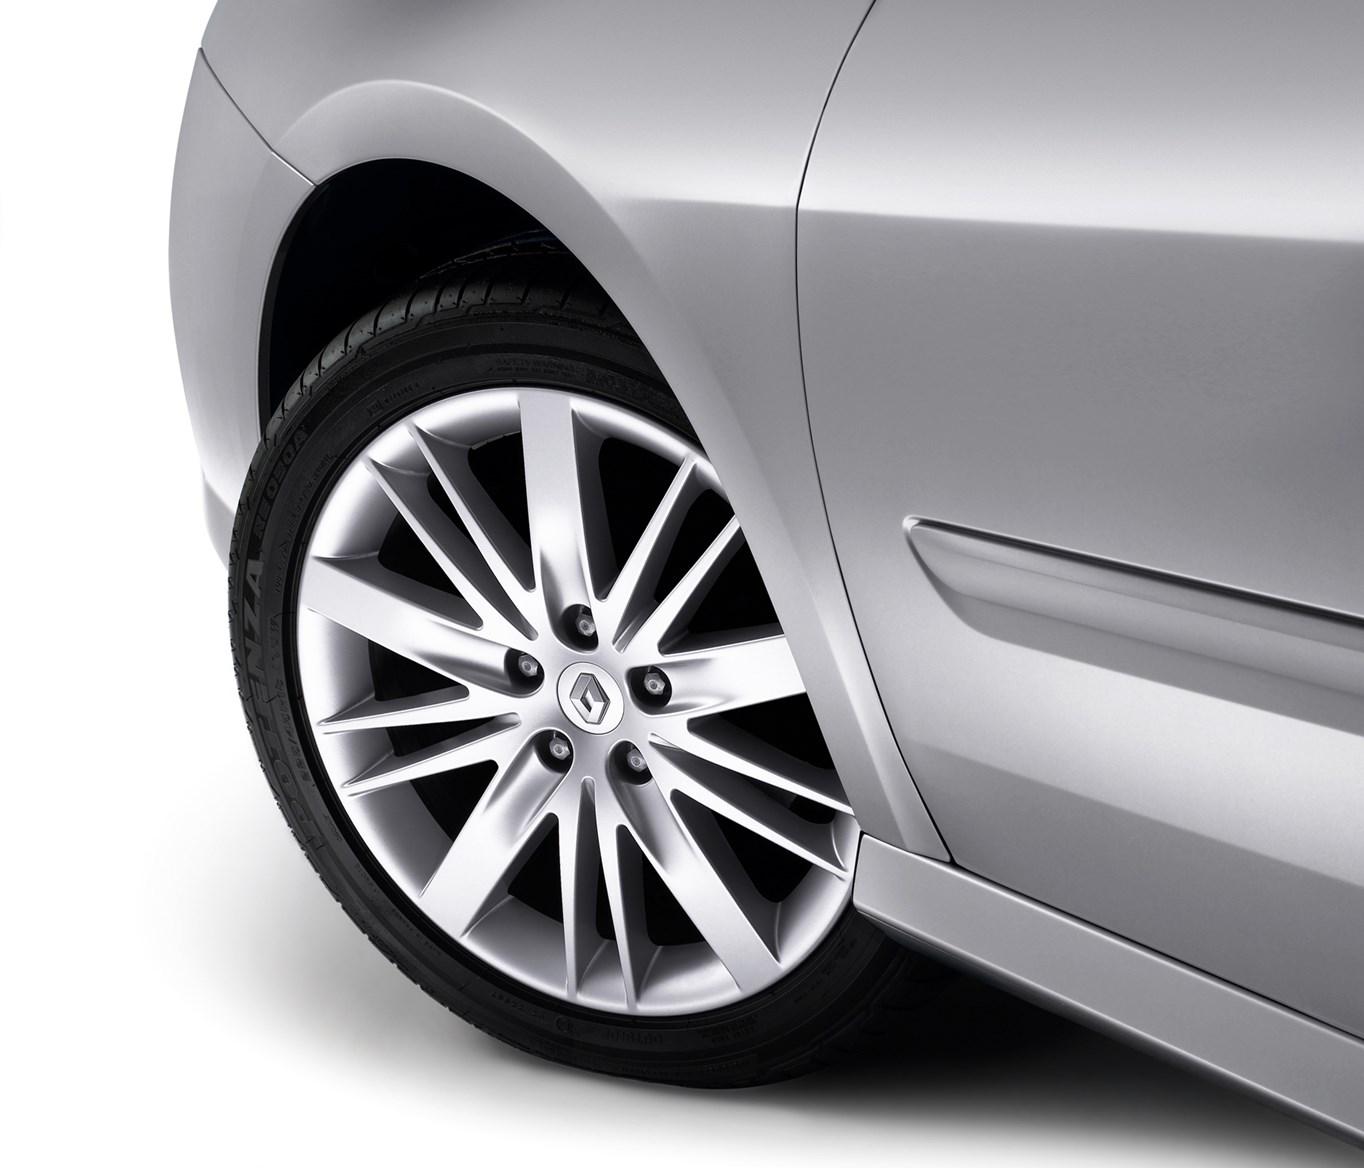 Renault Laguna Sport Tourer Review (2008 - 2012)